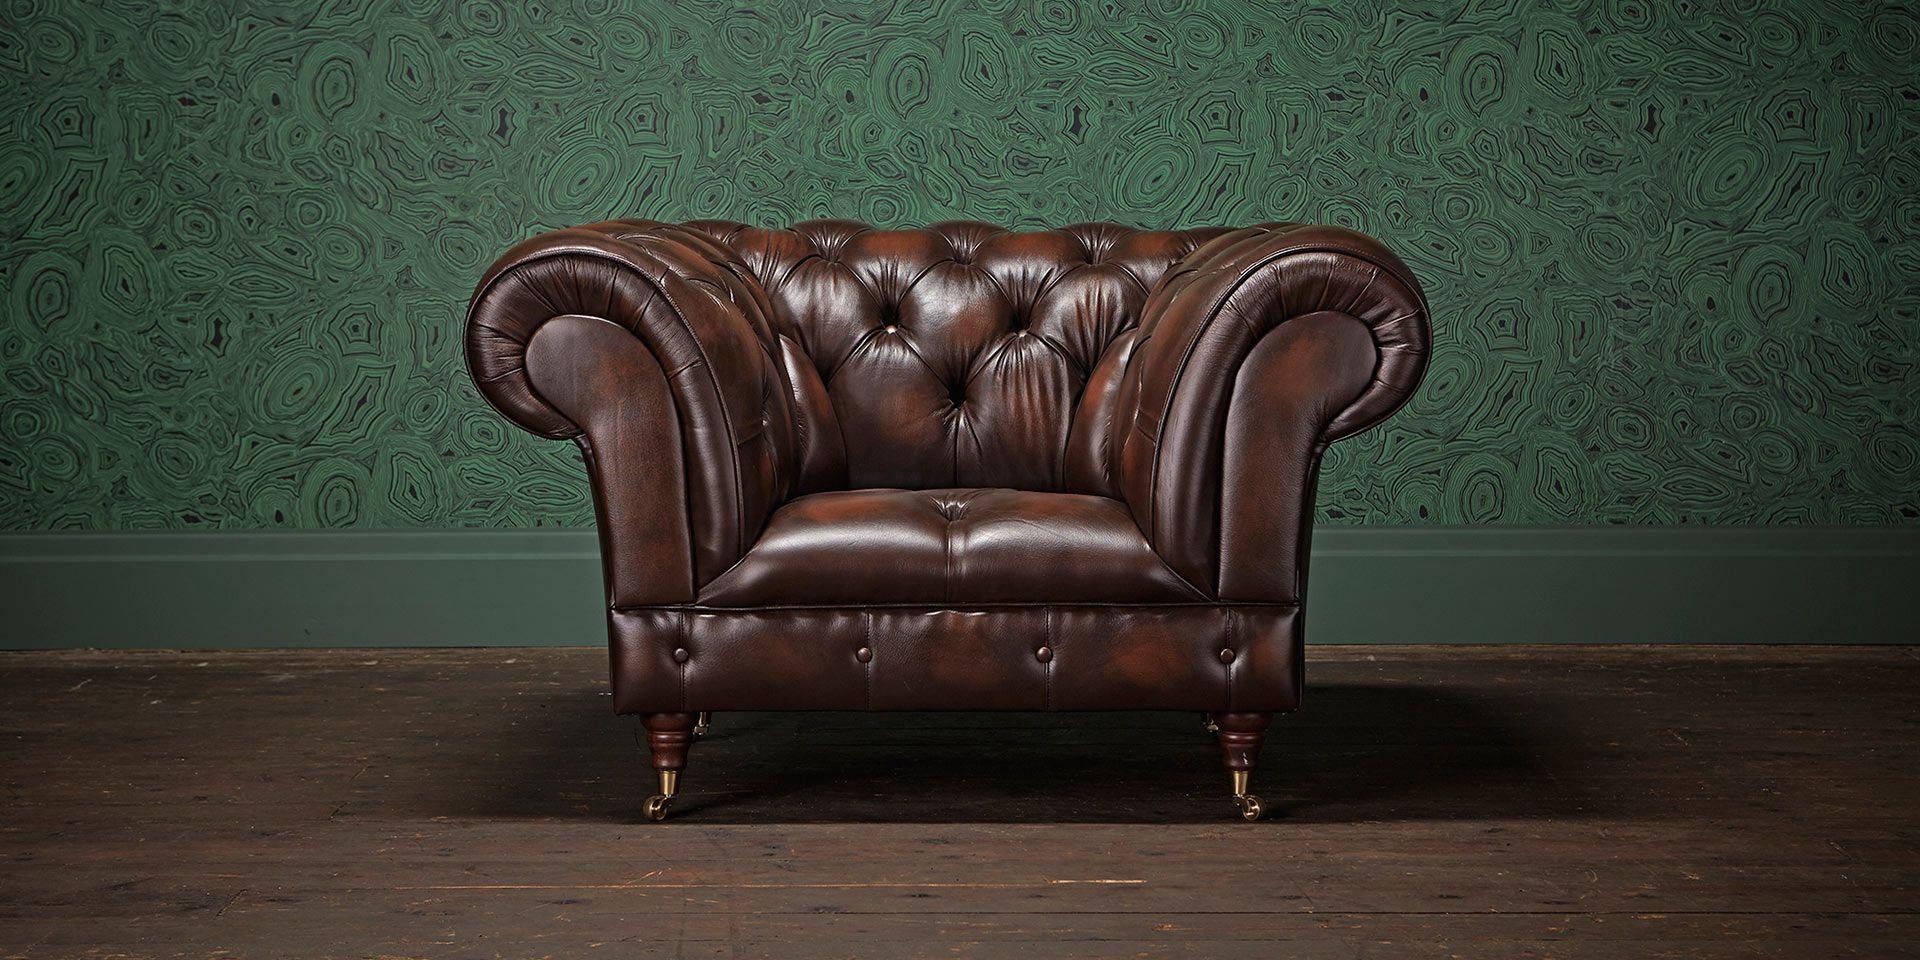 William Blake Chesterfield Sofa the 1931 | chesterfield, chesterfield sofa, comfortable sofa